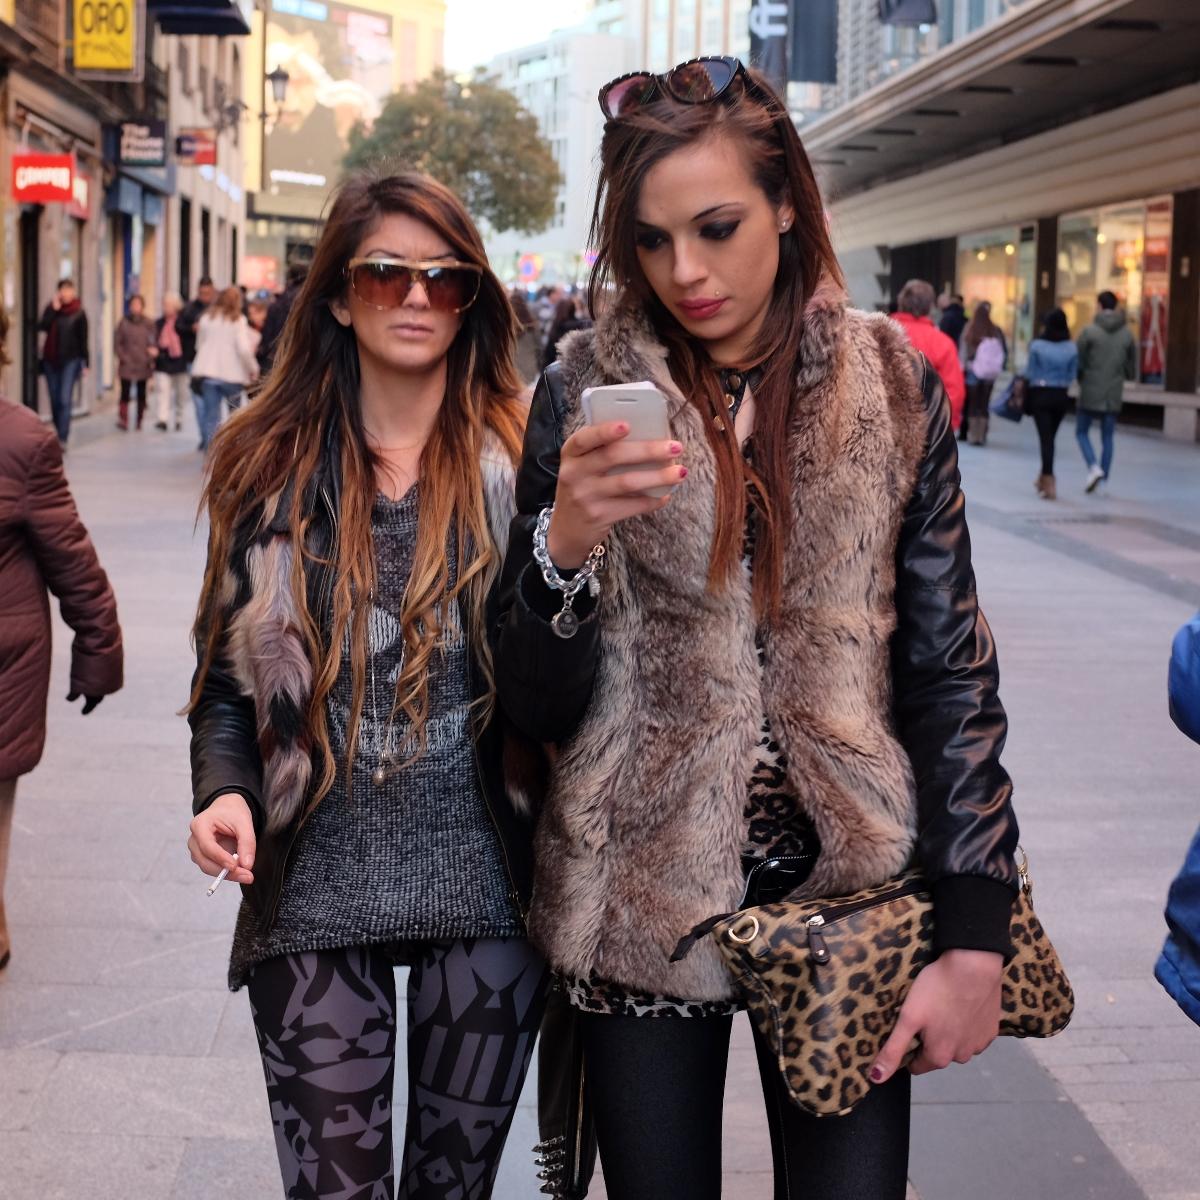 vogue fashion night out madrid 2014 madridea miguel de pereda